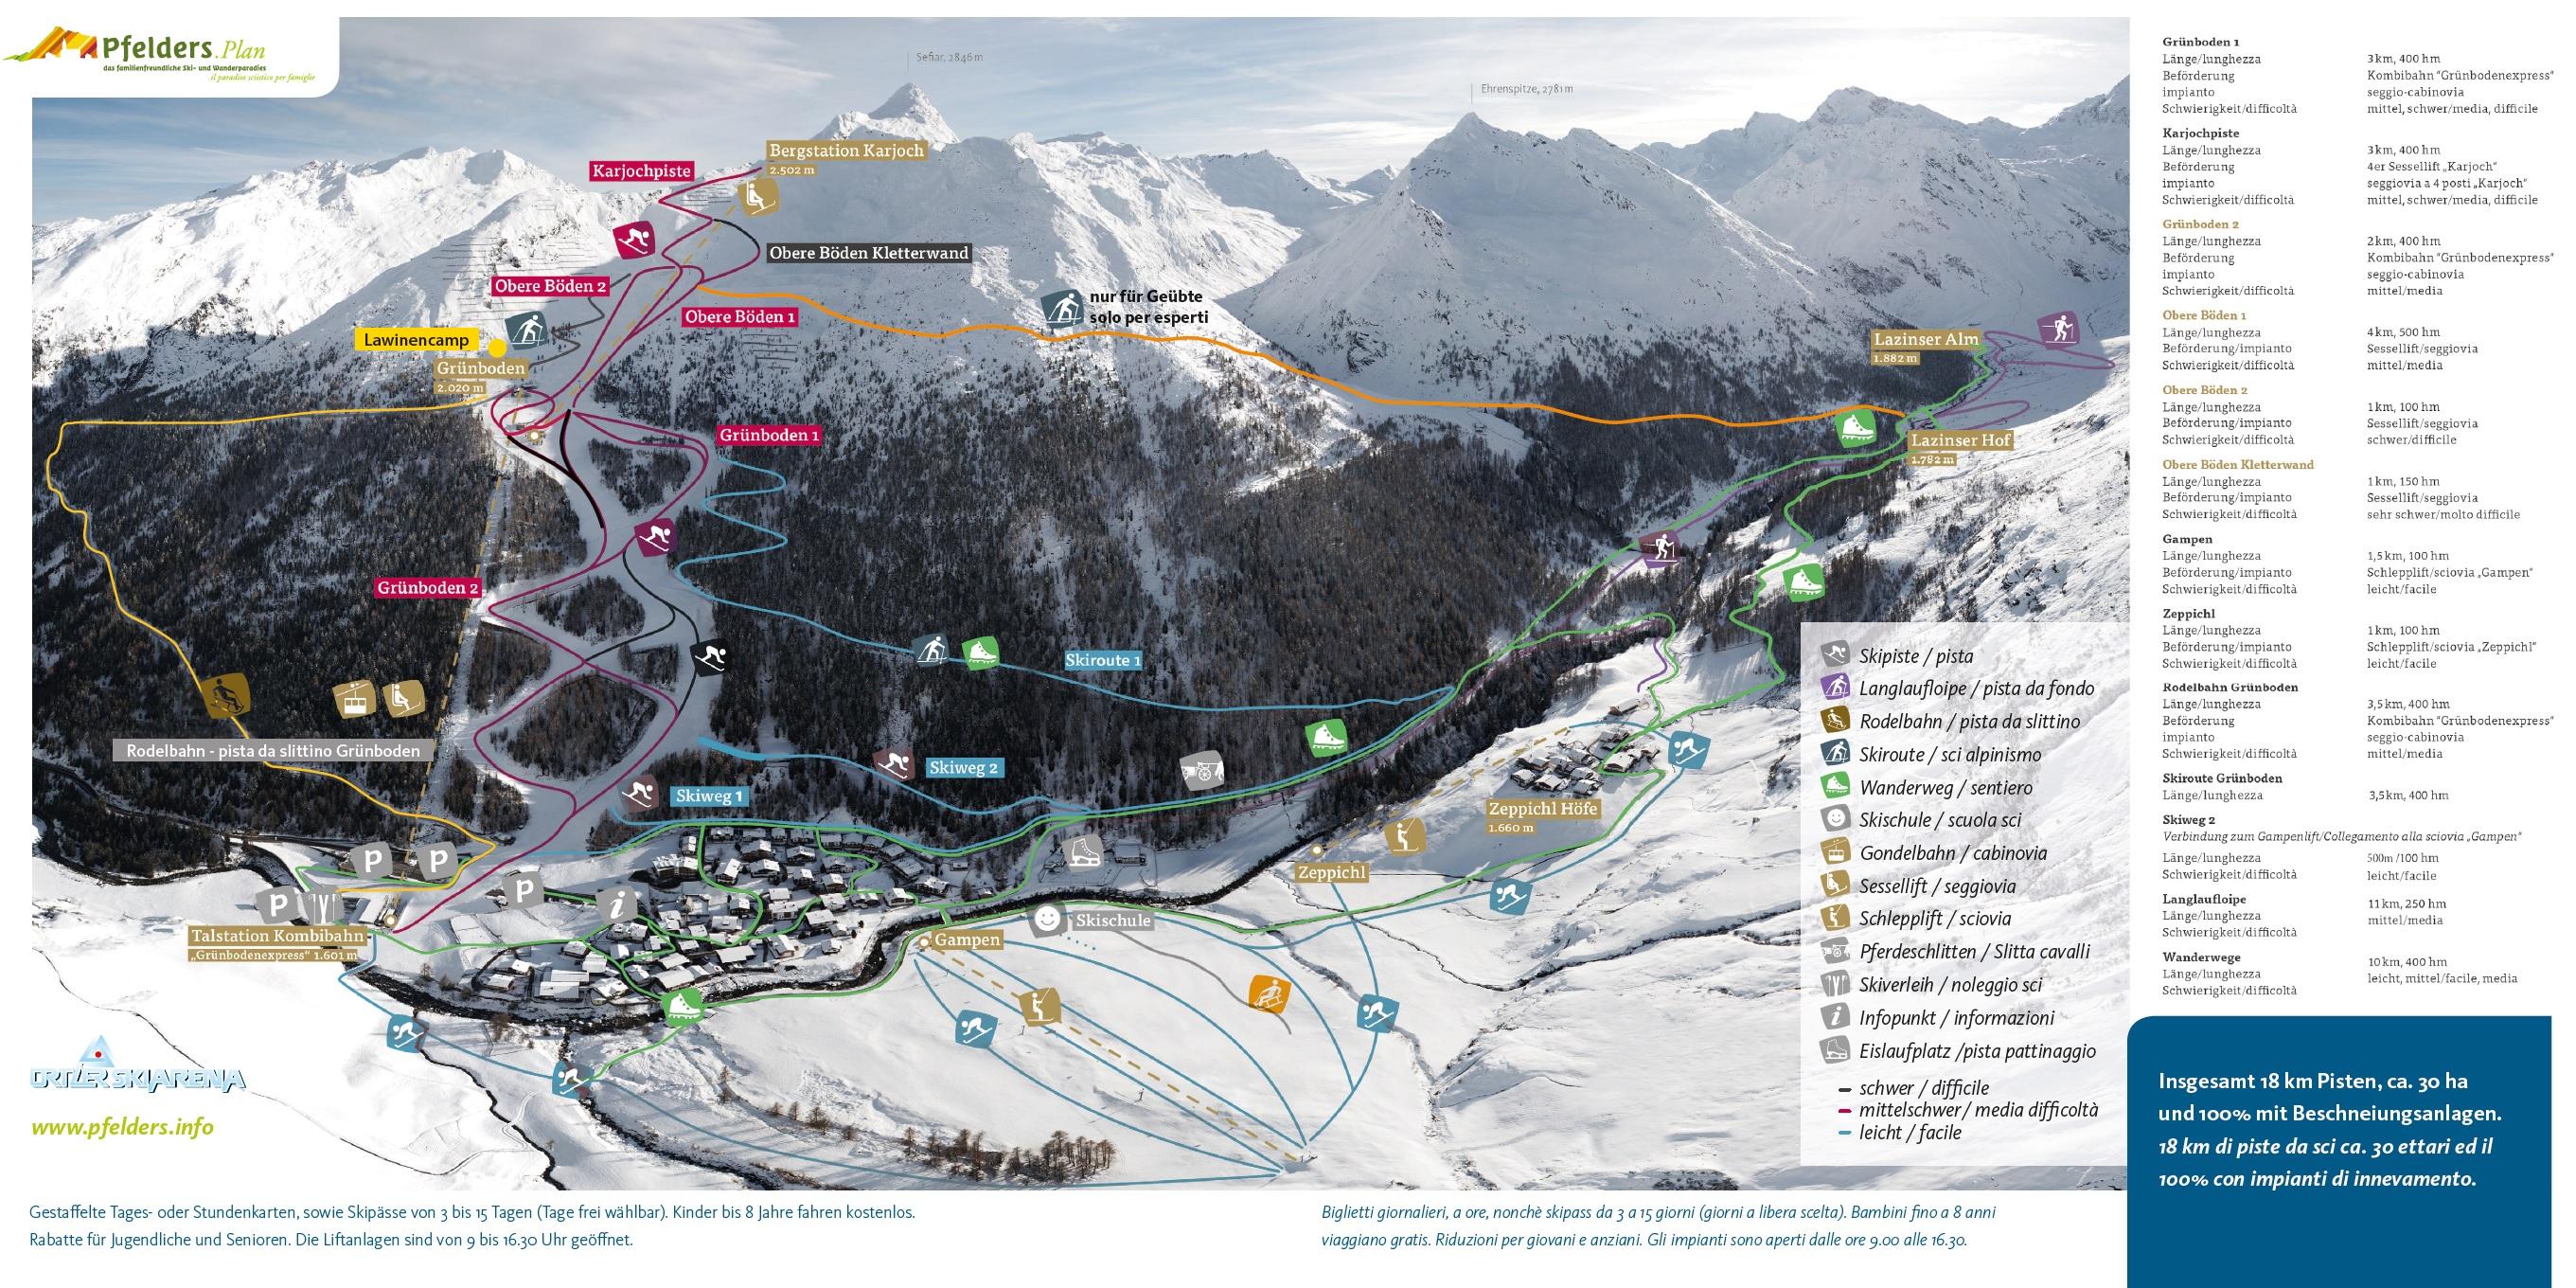 Trail map Pfelders Moos in Passeier